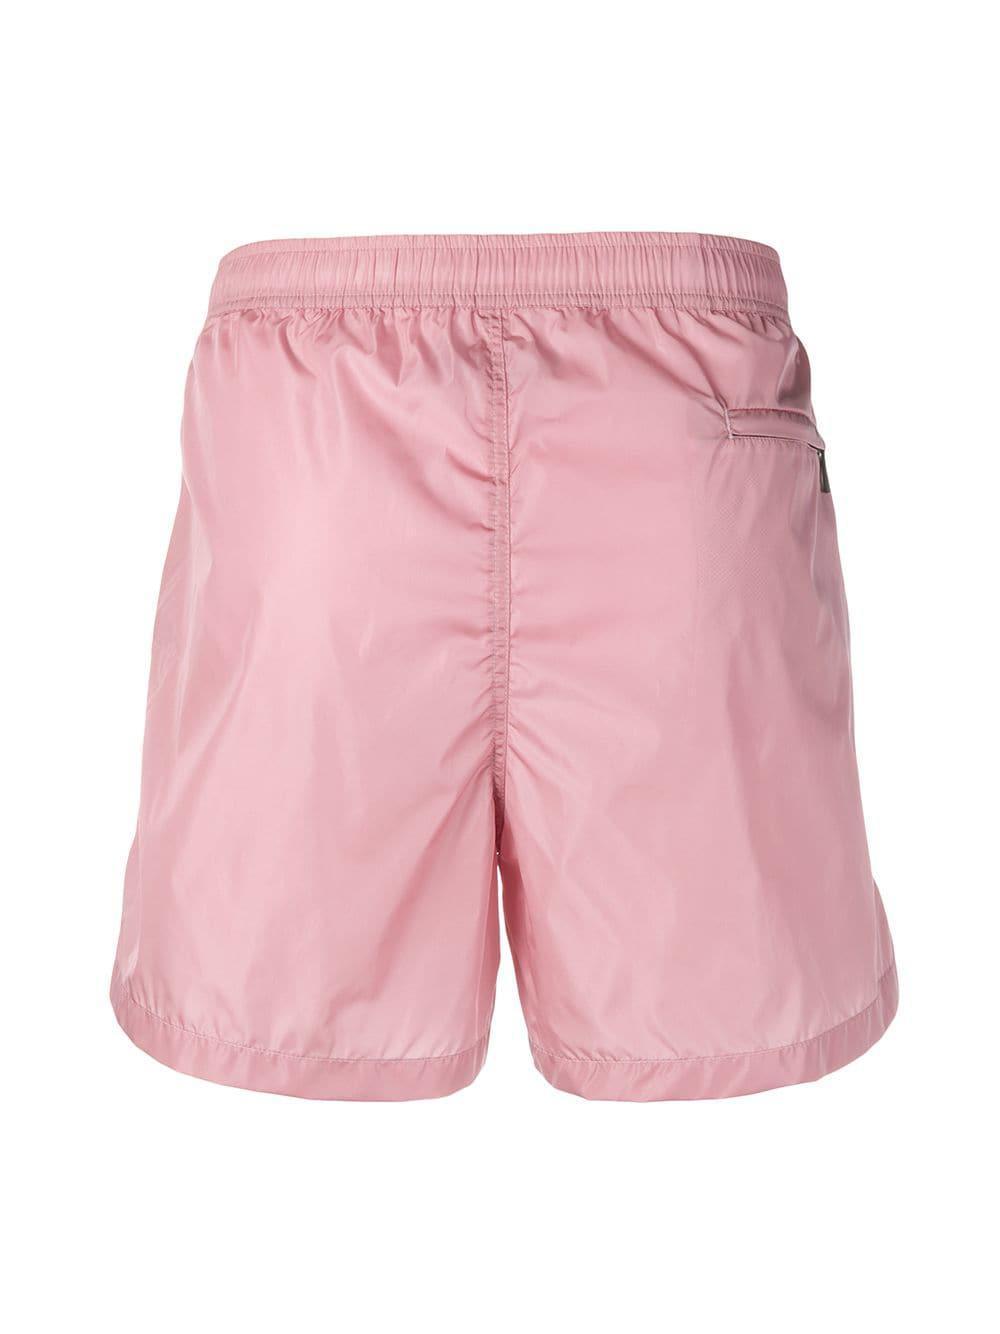 061f236f3c Lyst - Valentino Vltn Swim Shorts in Pink for Men